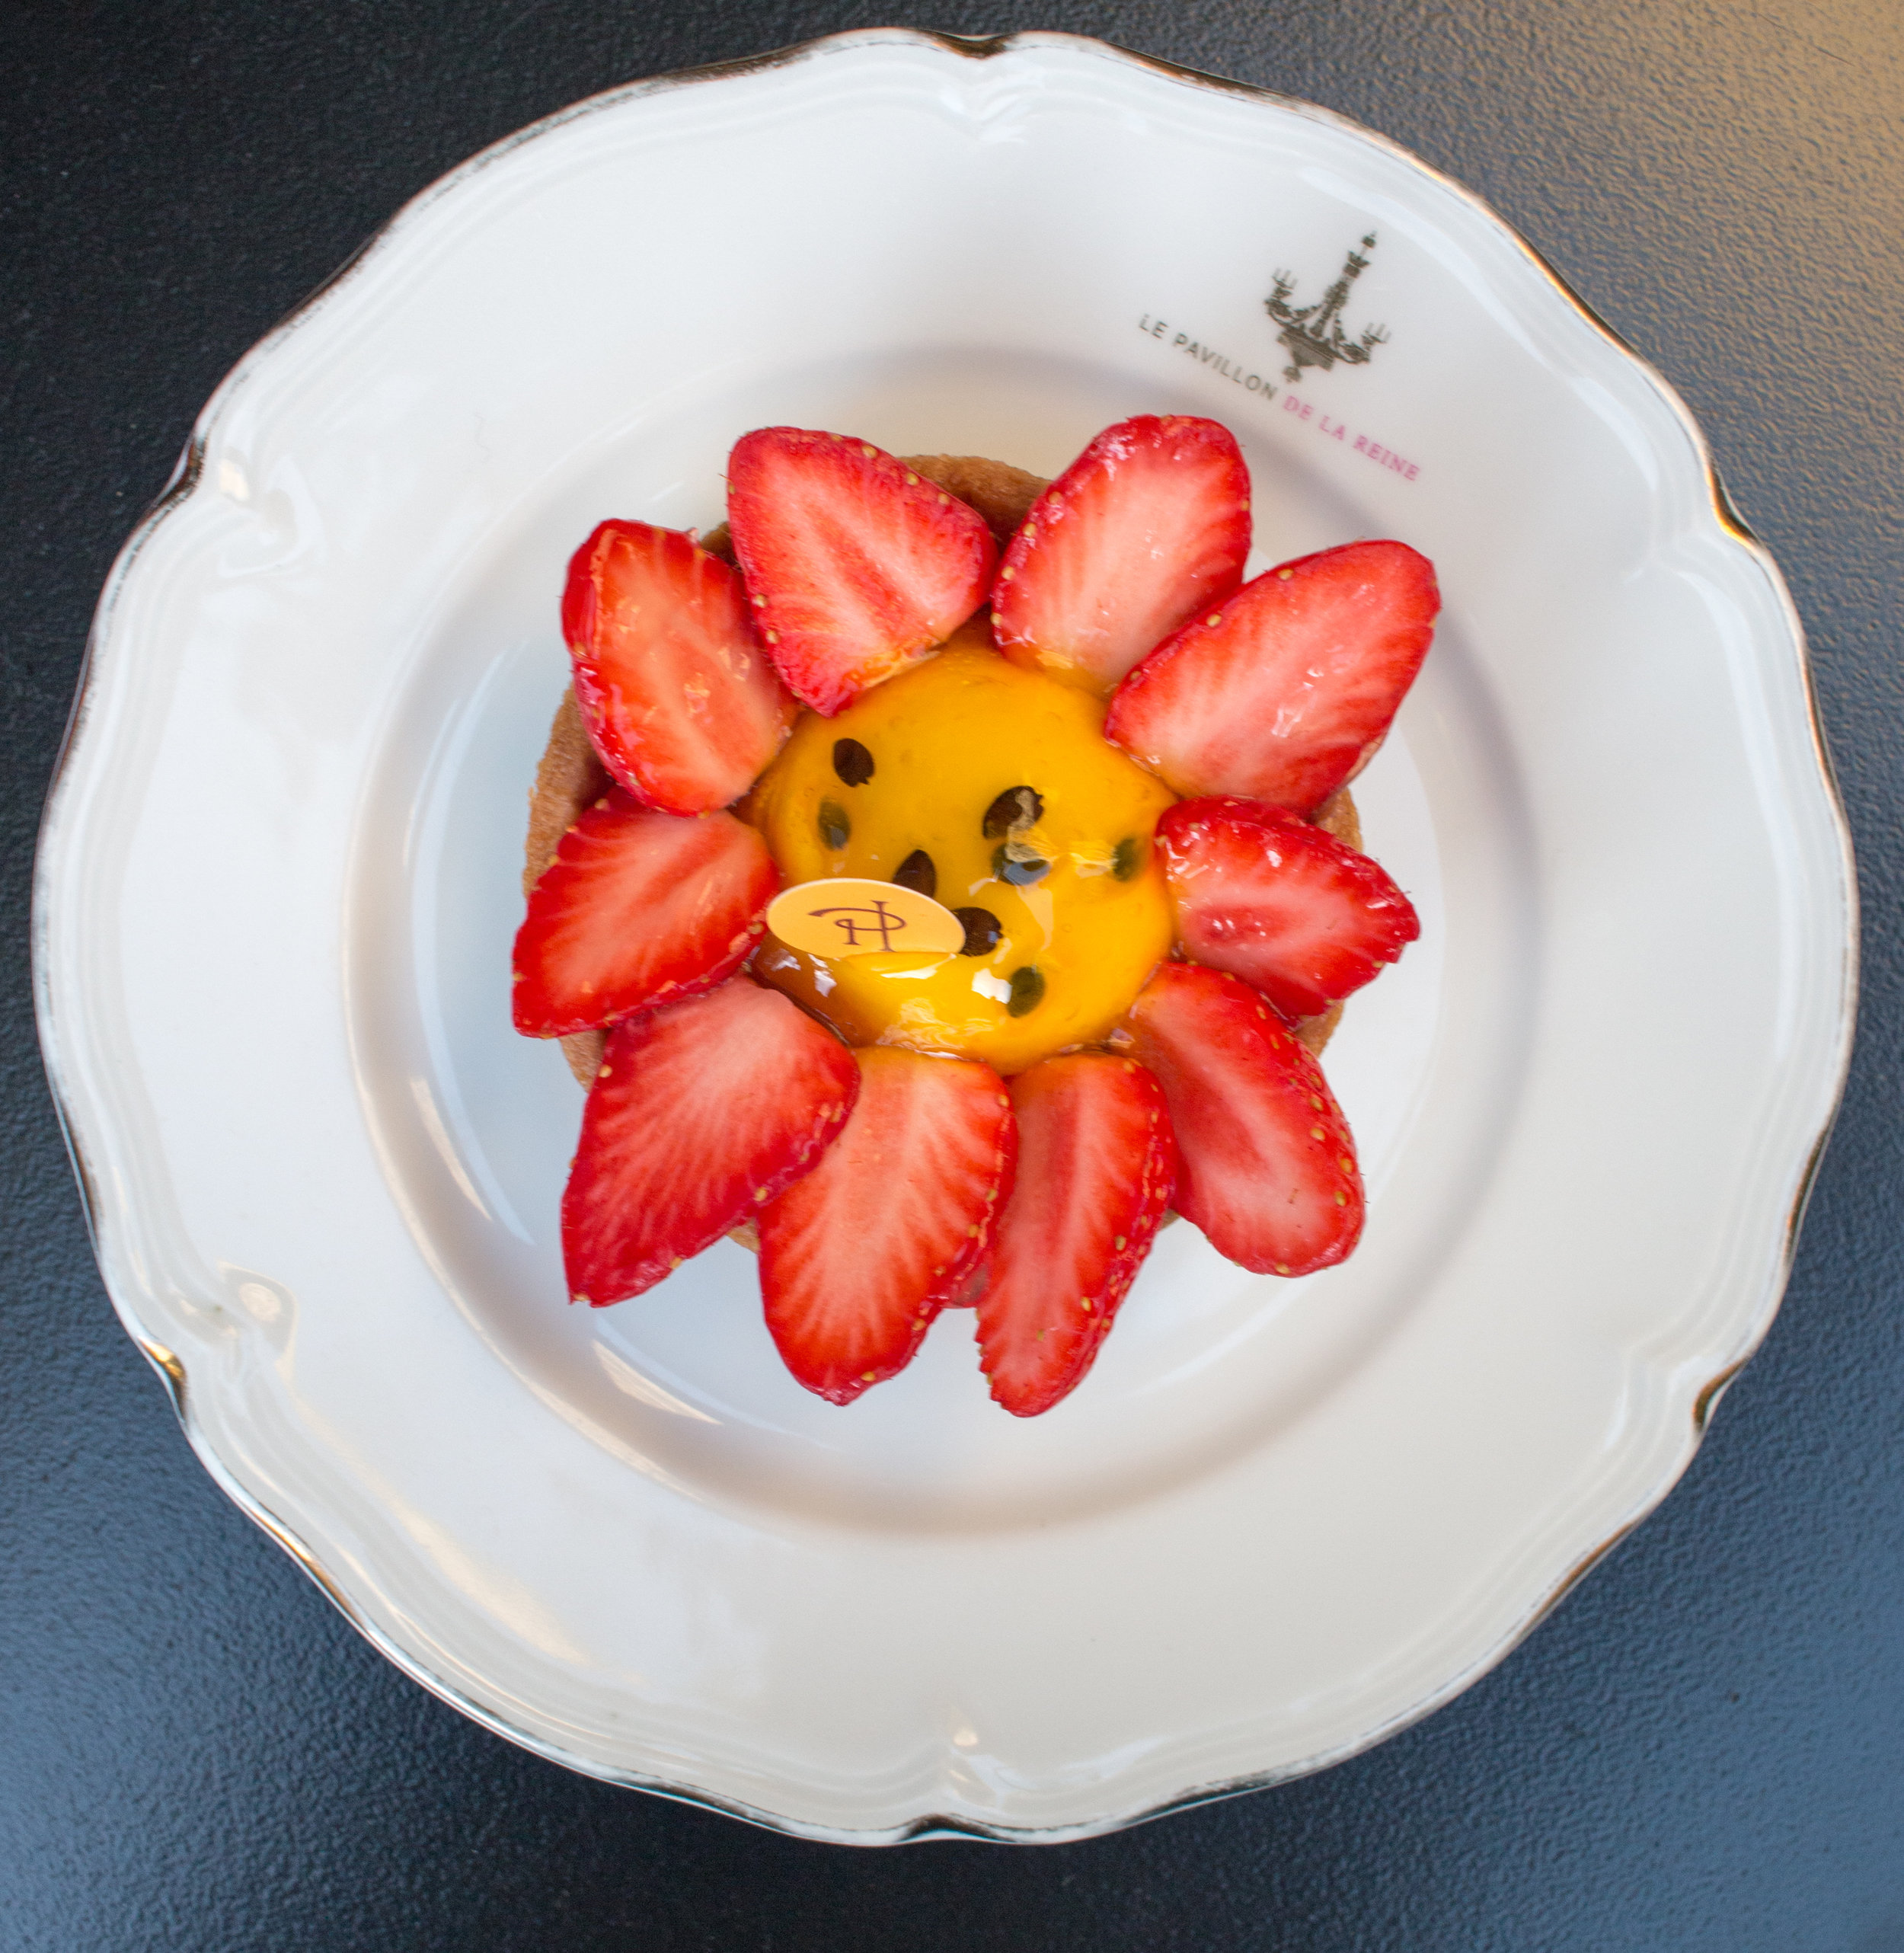 pierre hermé spring pastry